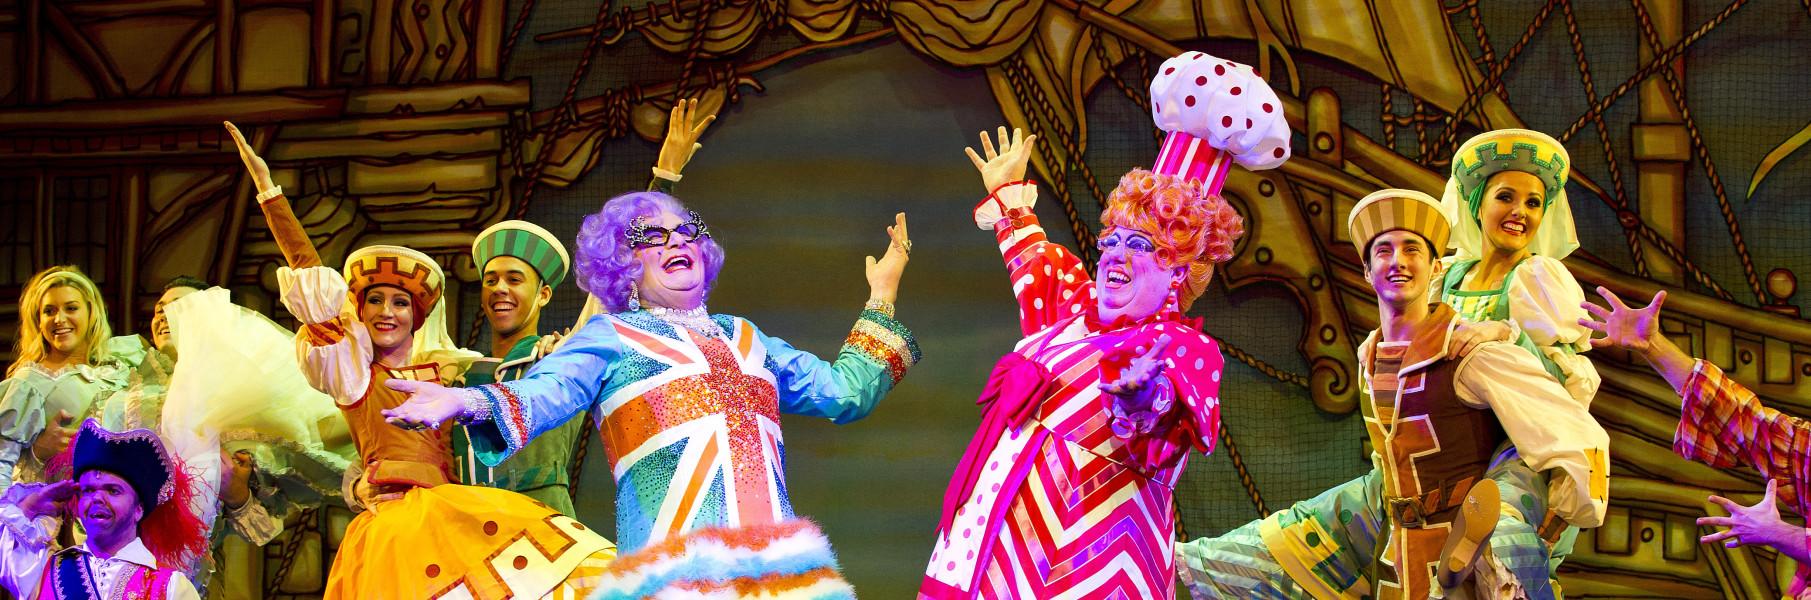 Image of Pantomime dames